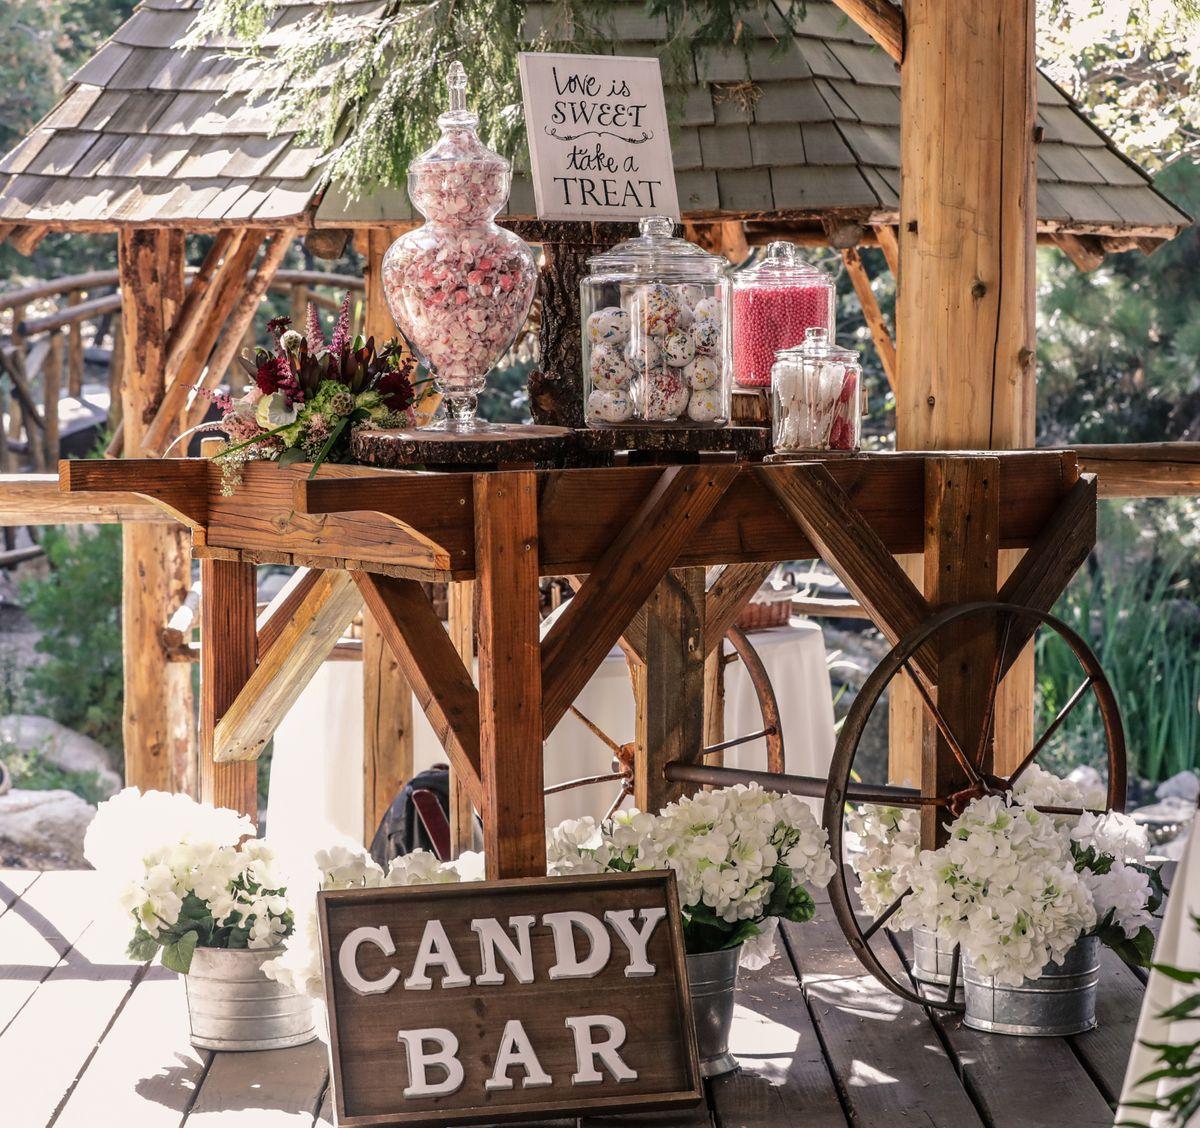 BoHo Candy Cart